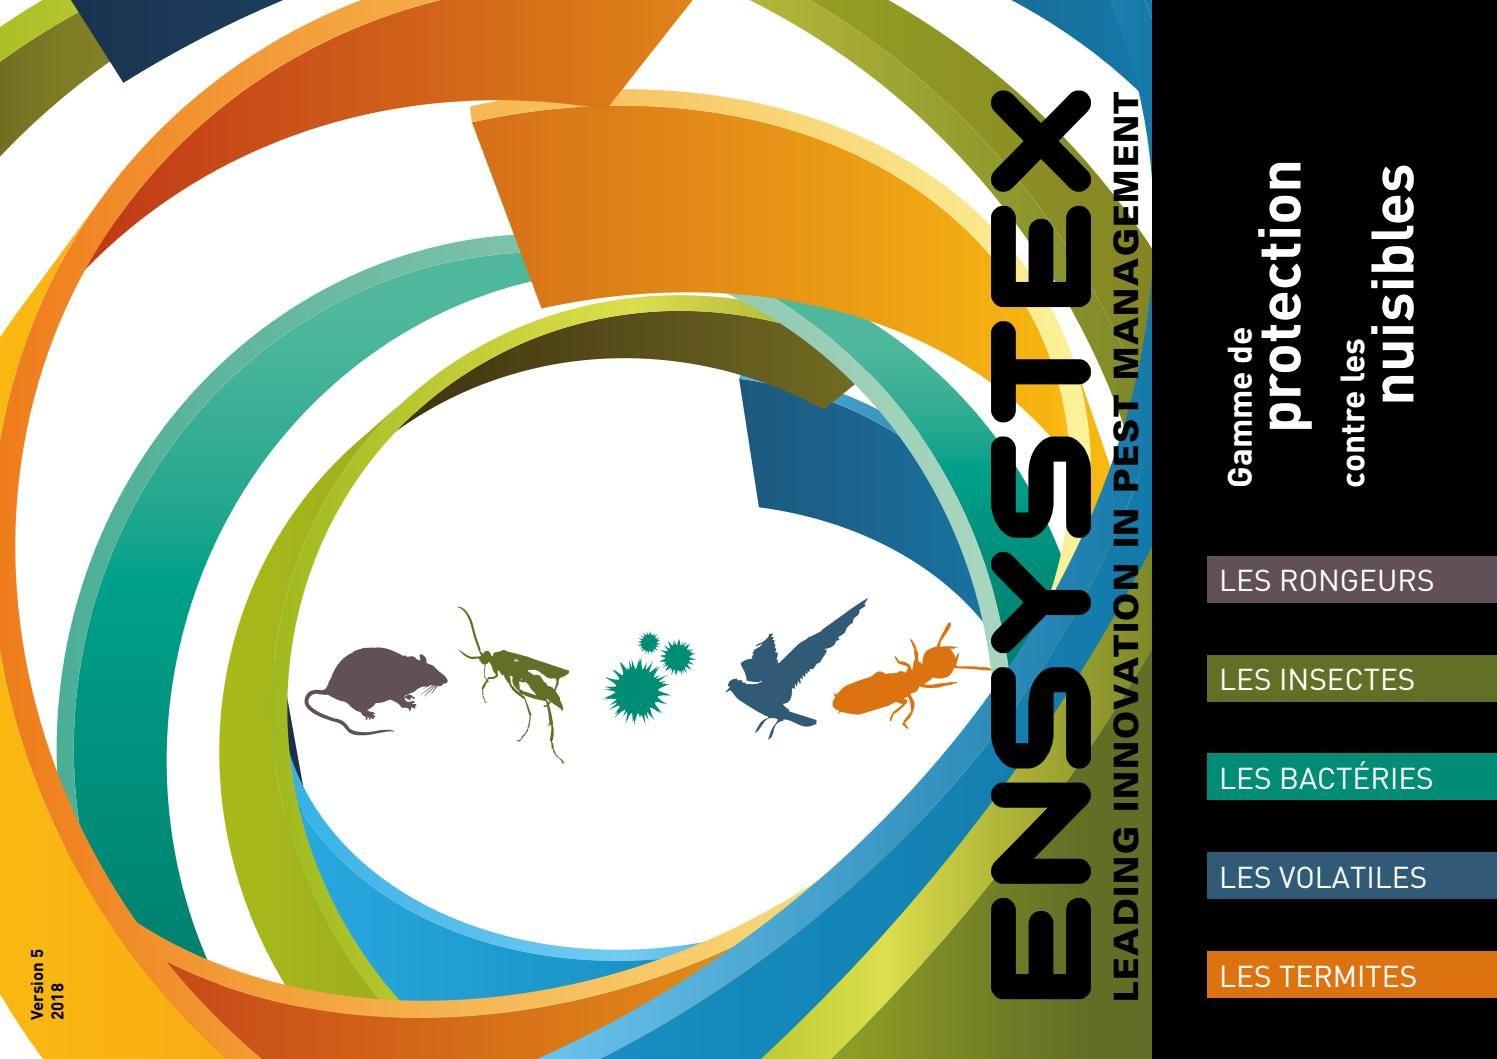 Detecteur Punaise De Lit Meilleur De Catalogue Ensystex Europe 2018 by Ensystex Europe issuu